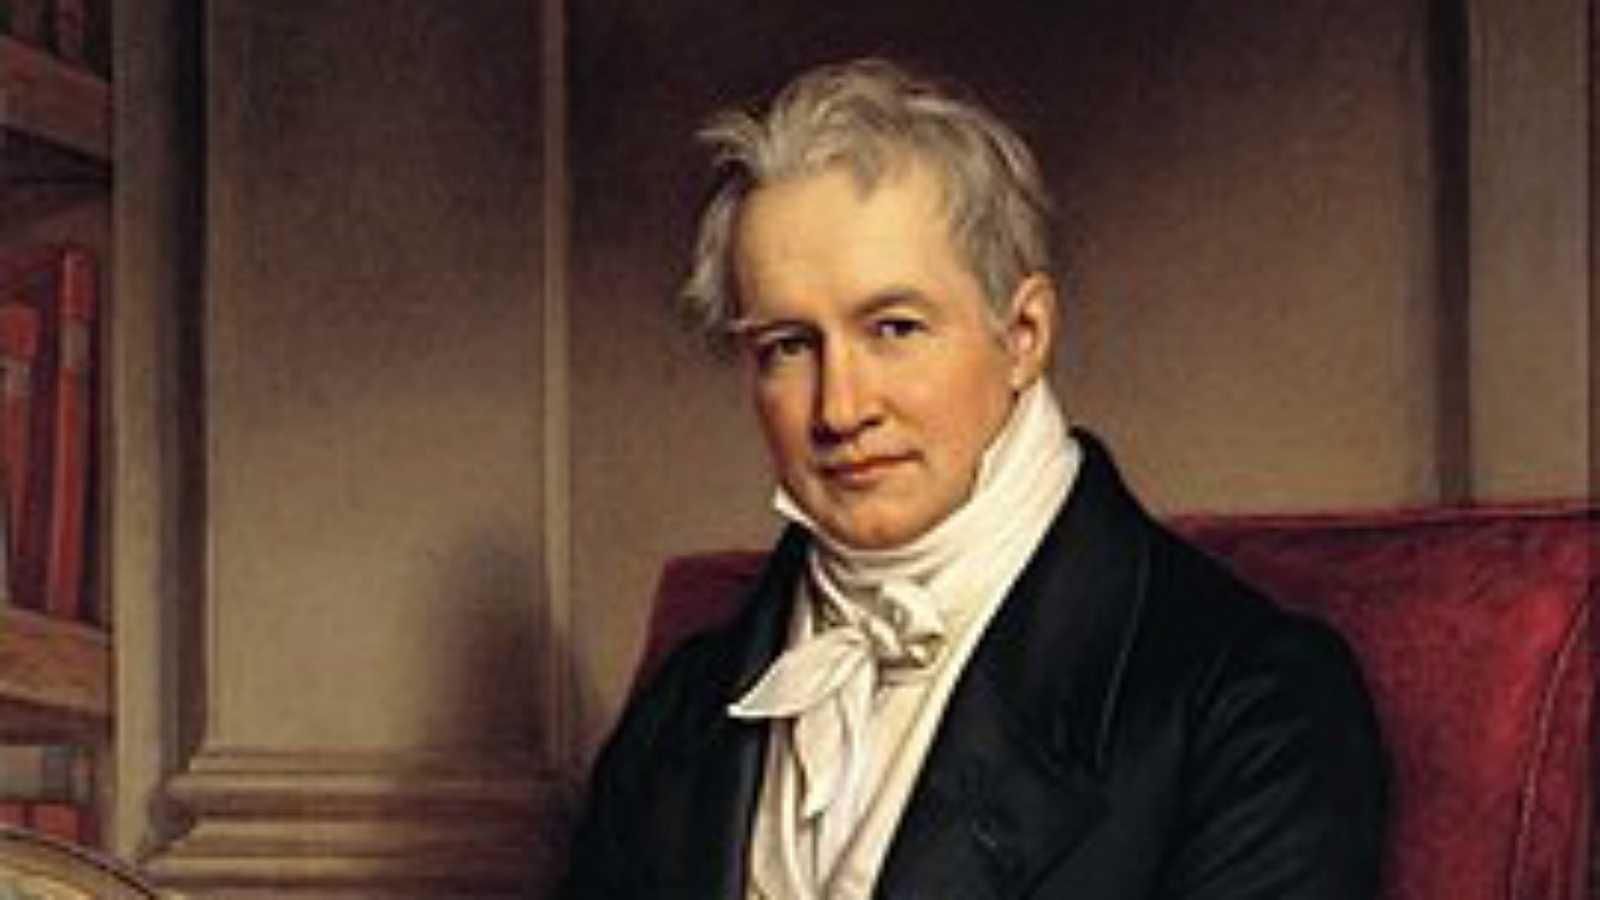 Reserva natural - Entrevistamos a Alexander von Humboldt - 18/12/19 - Escuchar ahora